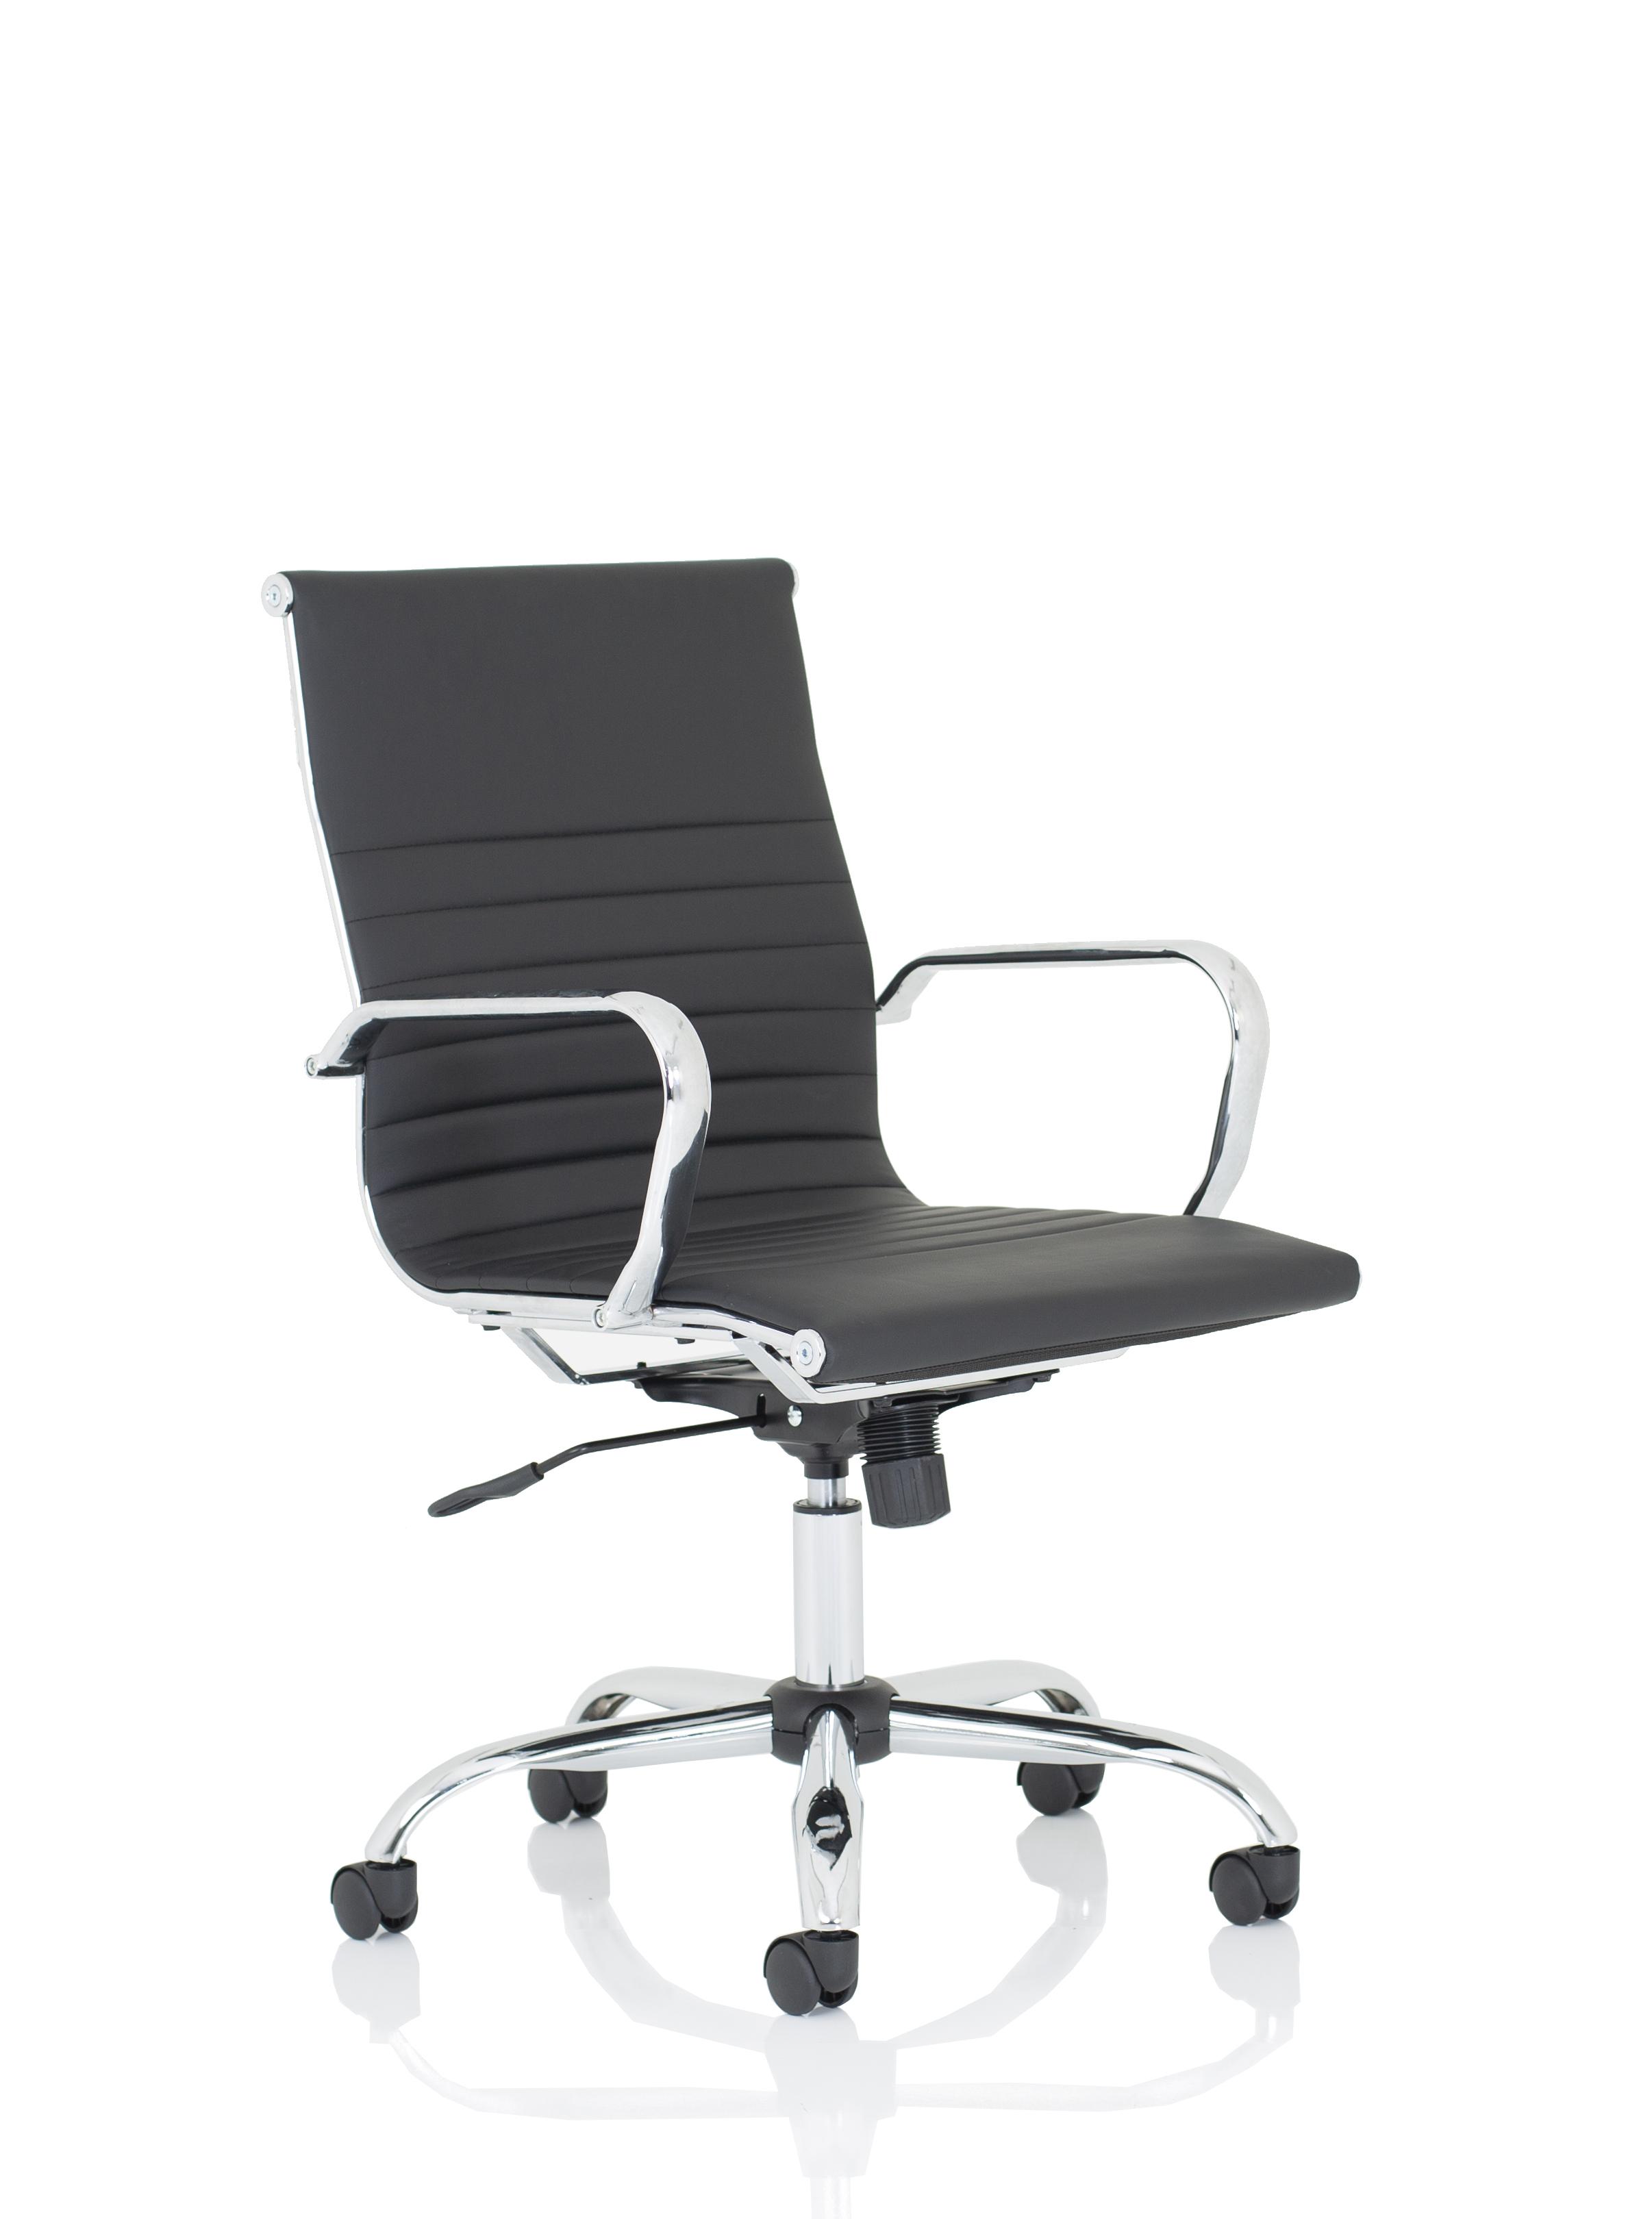 Executive Chairs Nola Medium Black Soft Bonded Leather Executive Chair OP000225